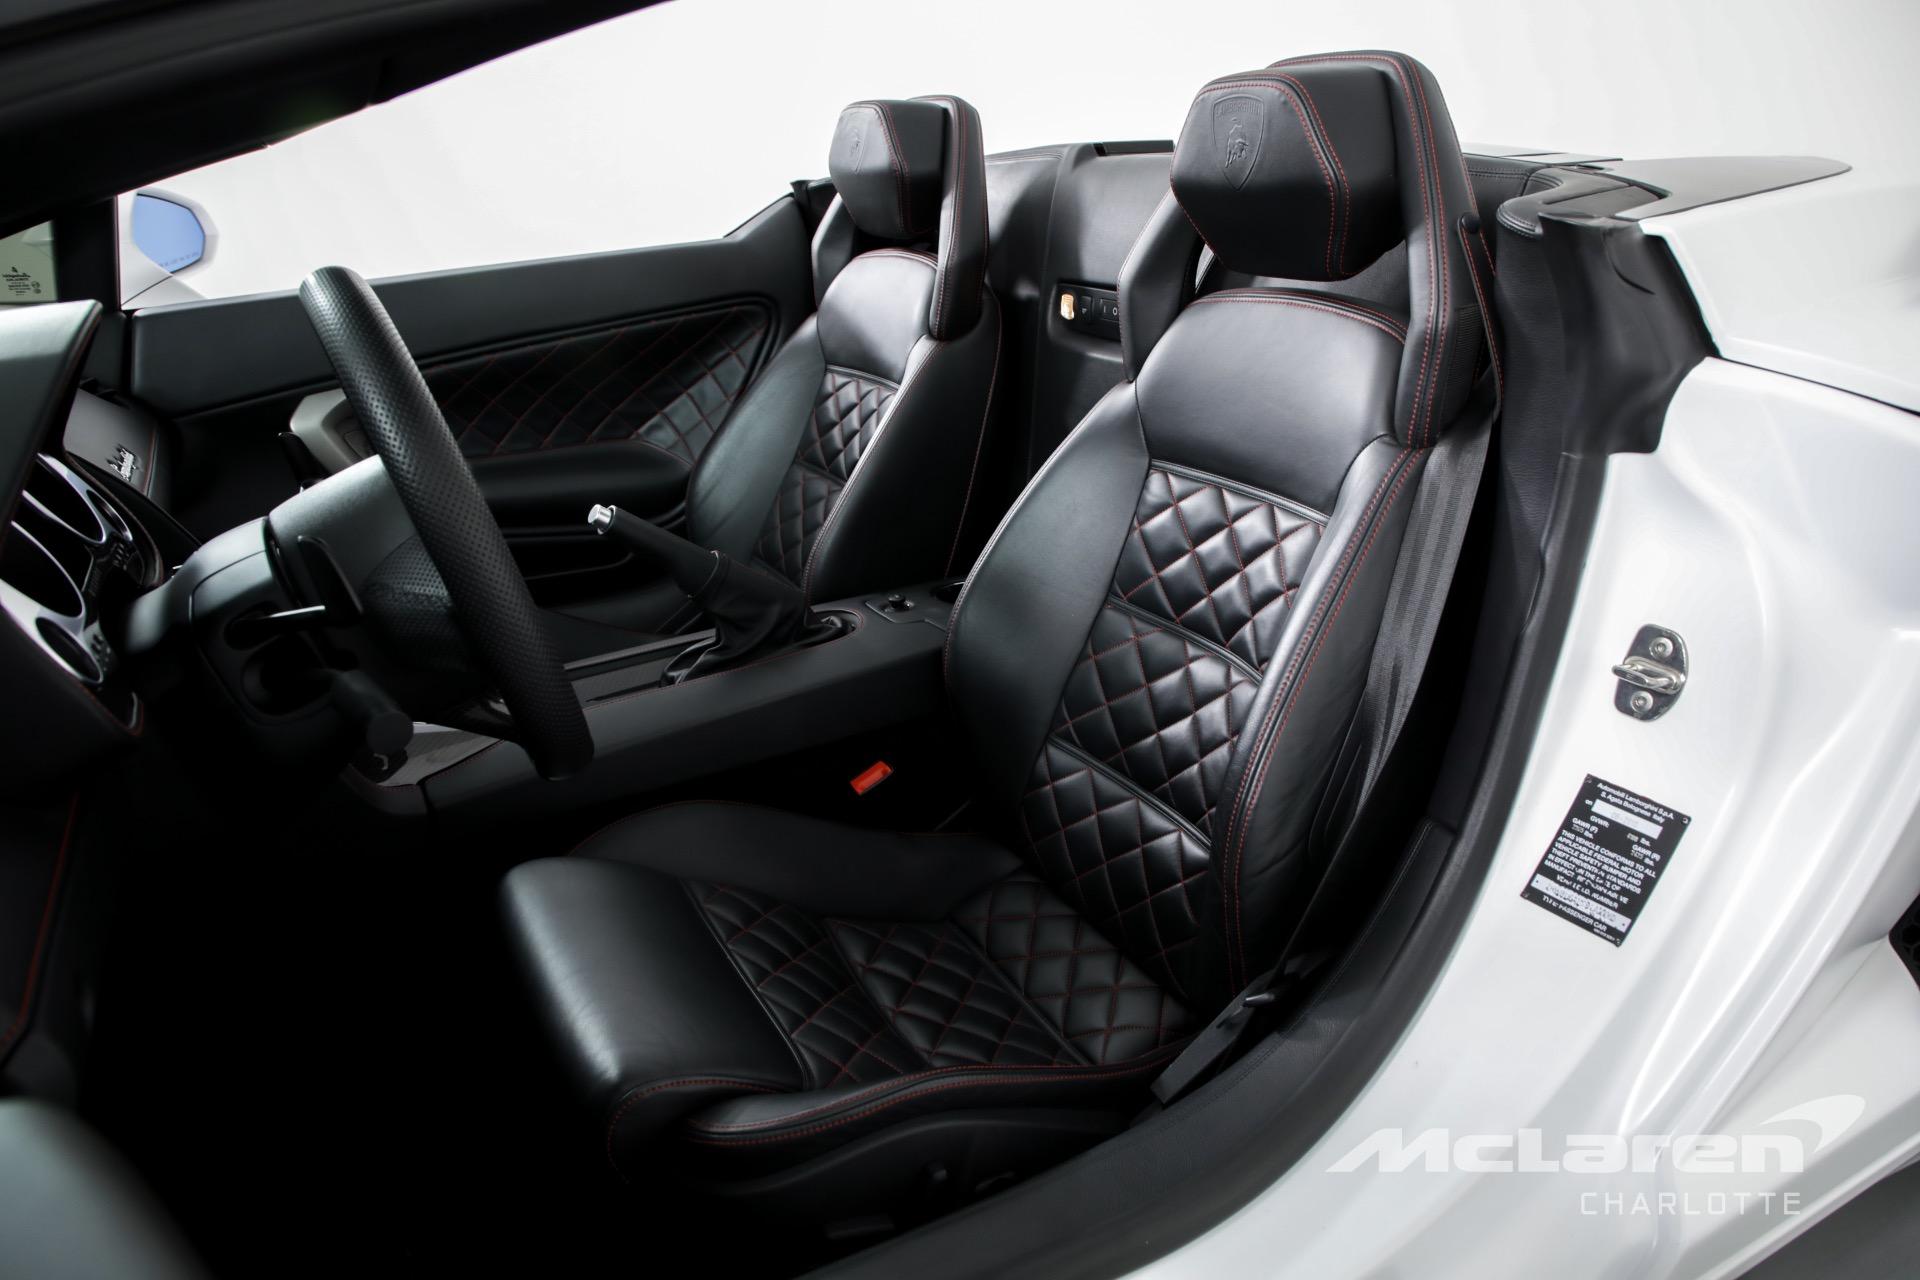 Used 2011 Lamborghini Gallardo LP 560-4 Spyder | Charlotte, NC